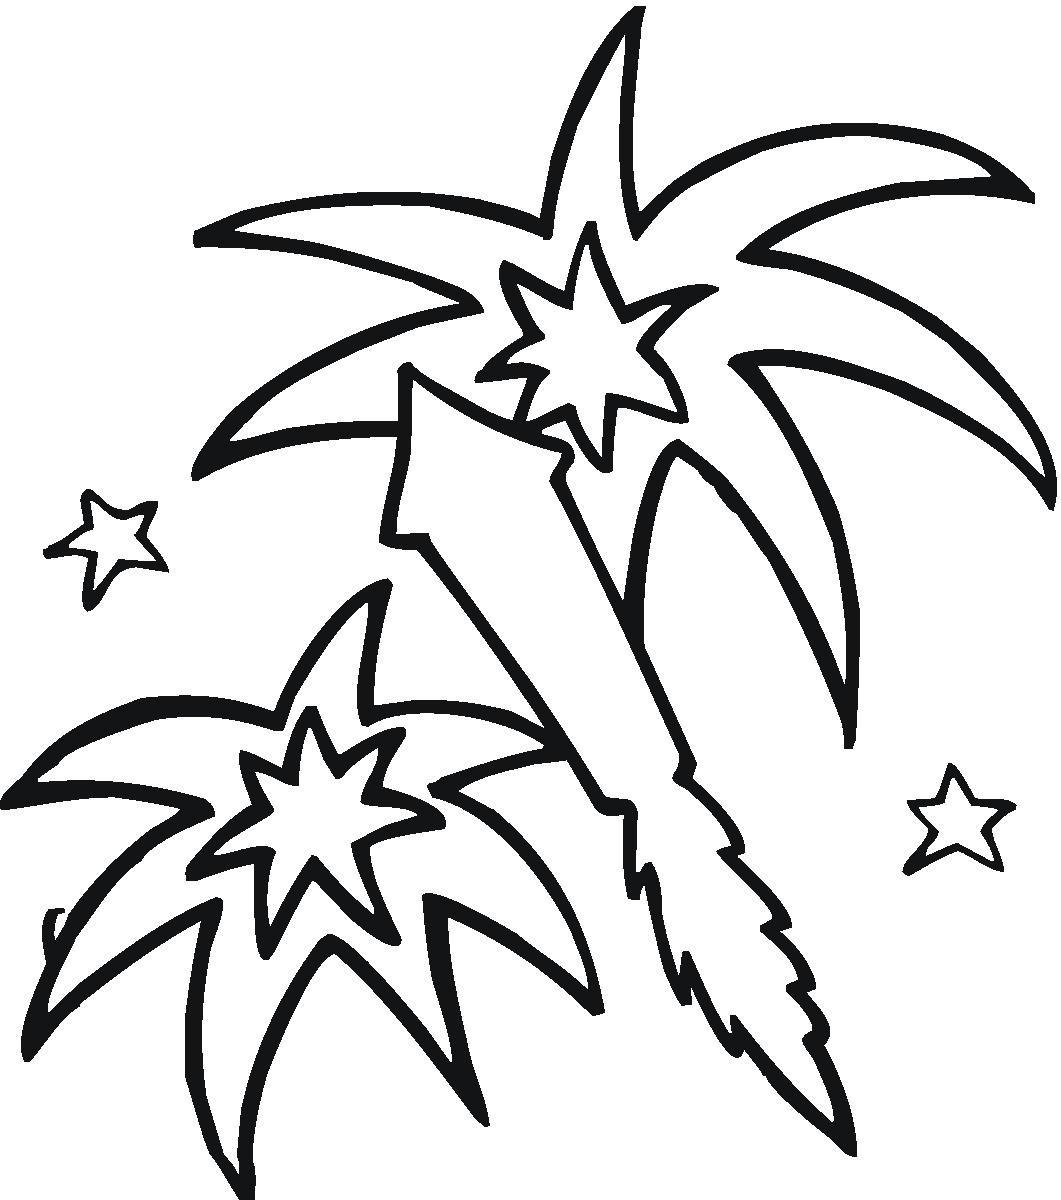 Free fireworks clip art image #4146